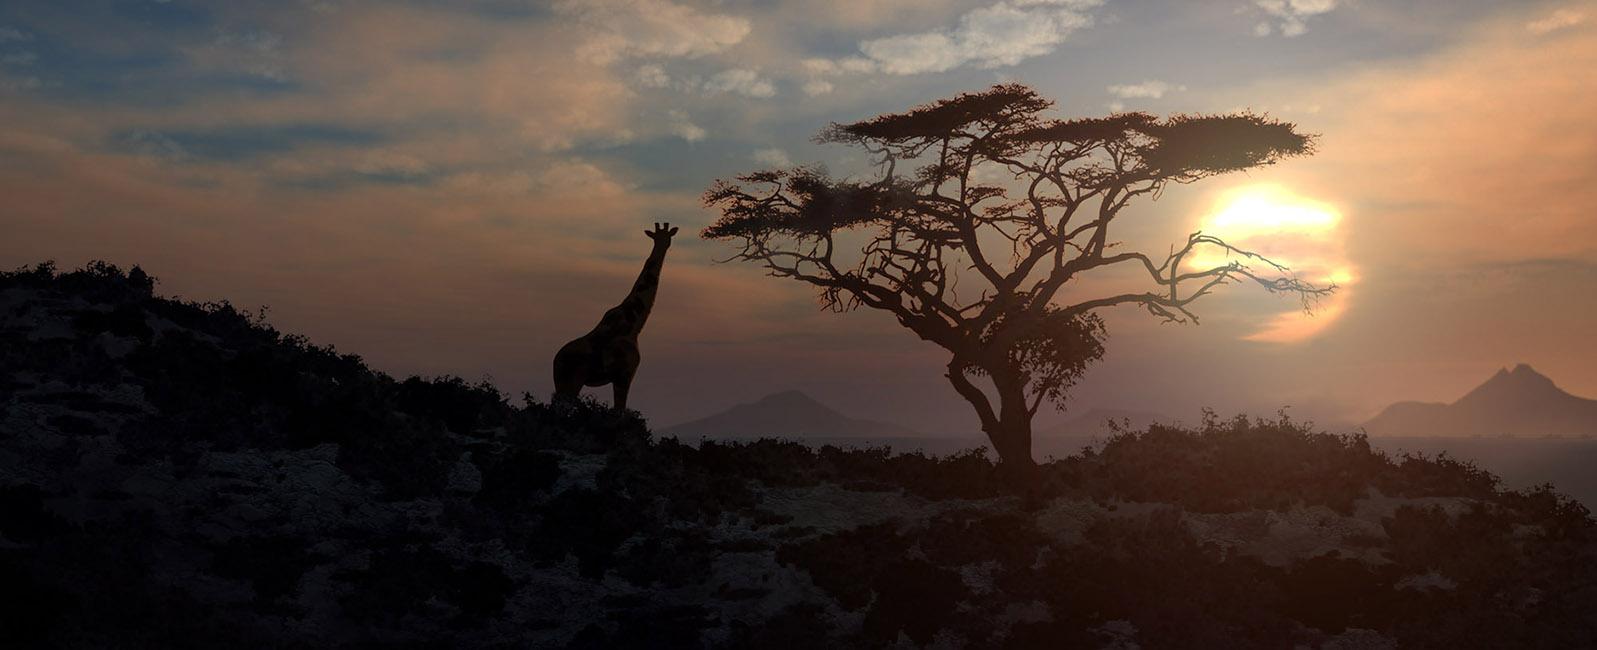 African-grassy-sunset-matte-Animation.jpg